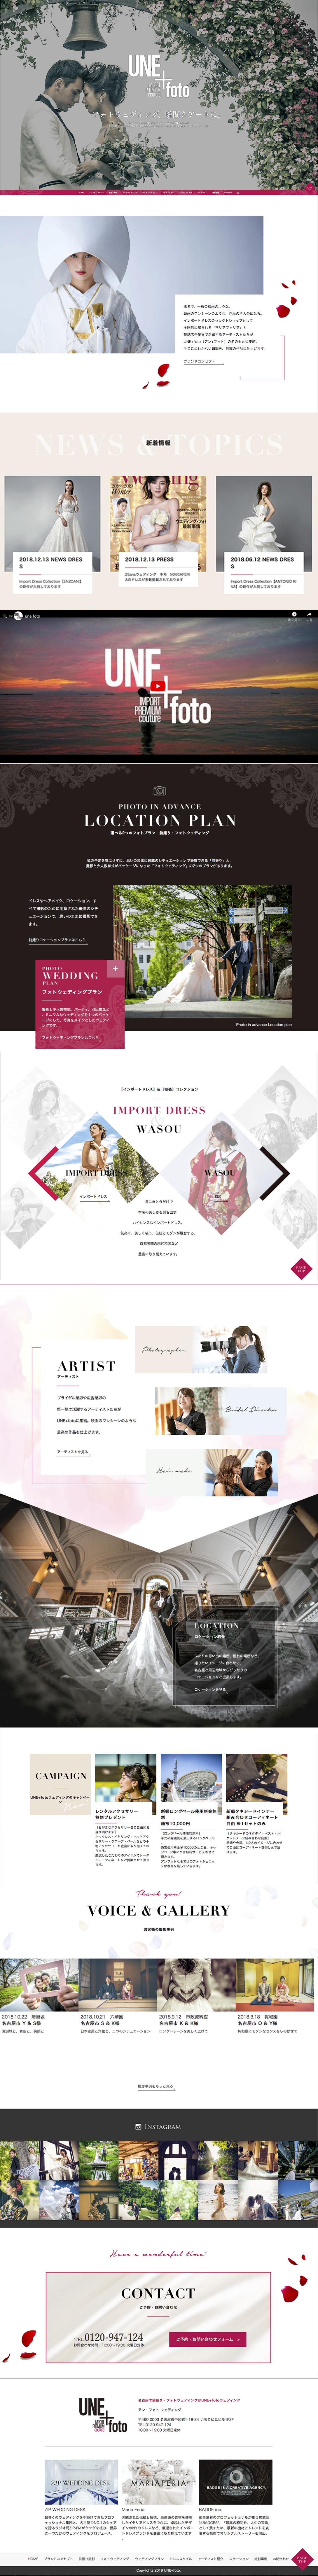 UNE-foto ブランドサイト制作